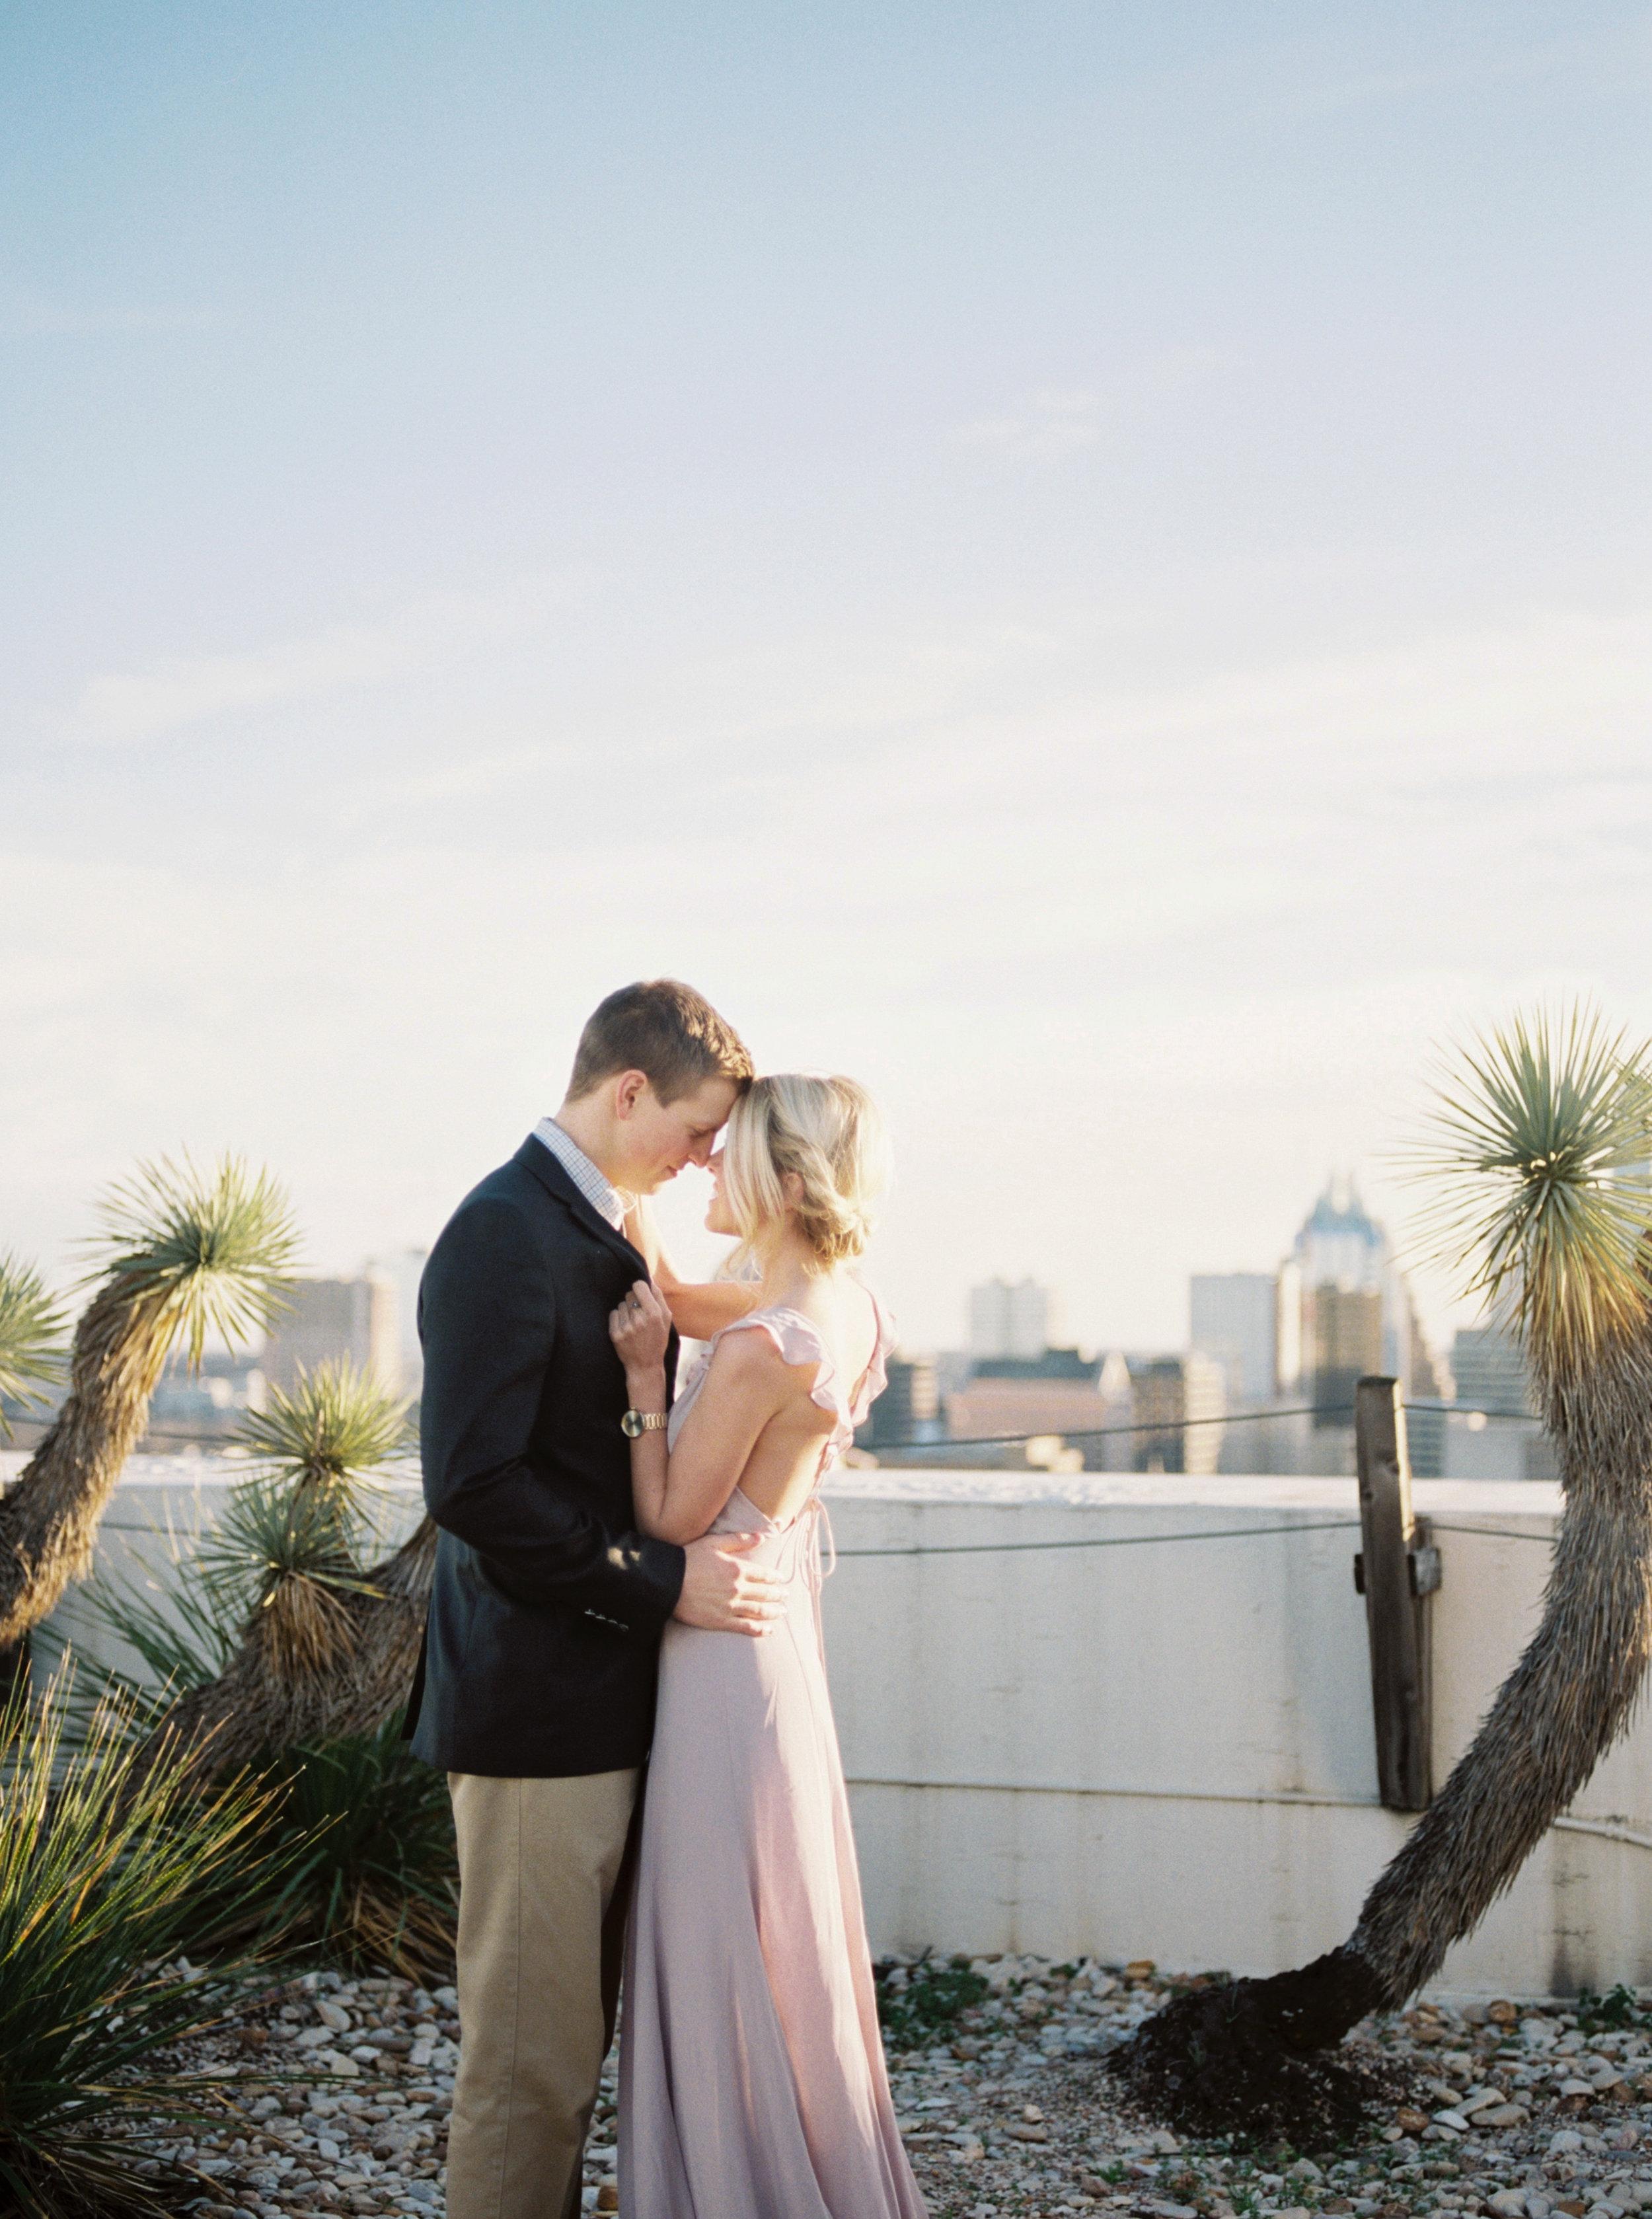 Austin Texas Fine Art Documentary Wedding Photographer -7.jpg